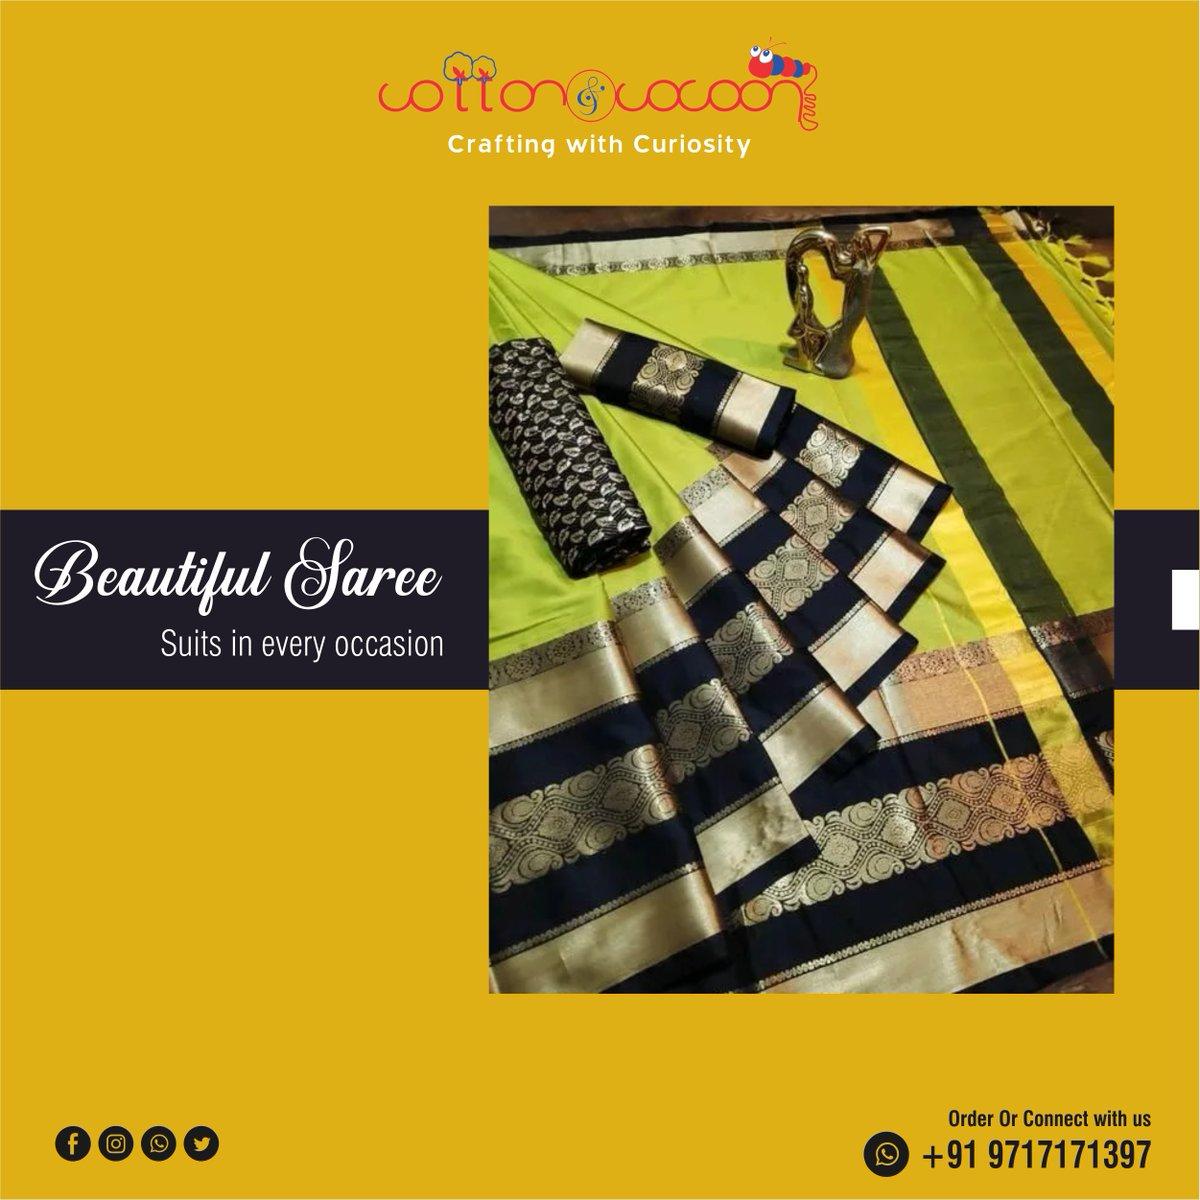 Your presence should be unique! wear our unique collection to be unique. #Handicraft #Artandcraft #delhi #uttamnagar #india #designersaree #banarasisilksarees #greensaree #sareefashion #bollywoodsarees #sareeswag #partywearsaree #partywearsareesonline #girlfashionpic.twitter.com/z7ODAvfMv5